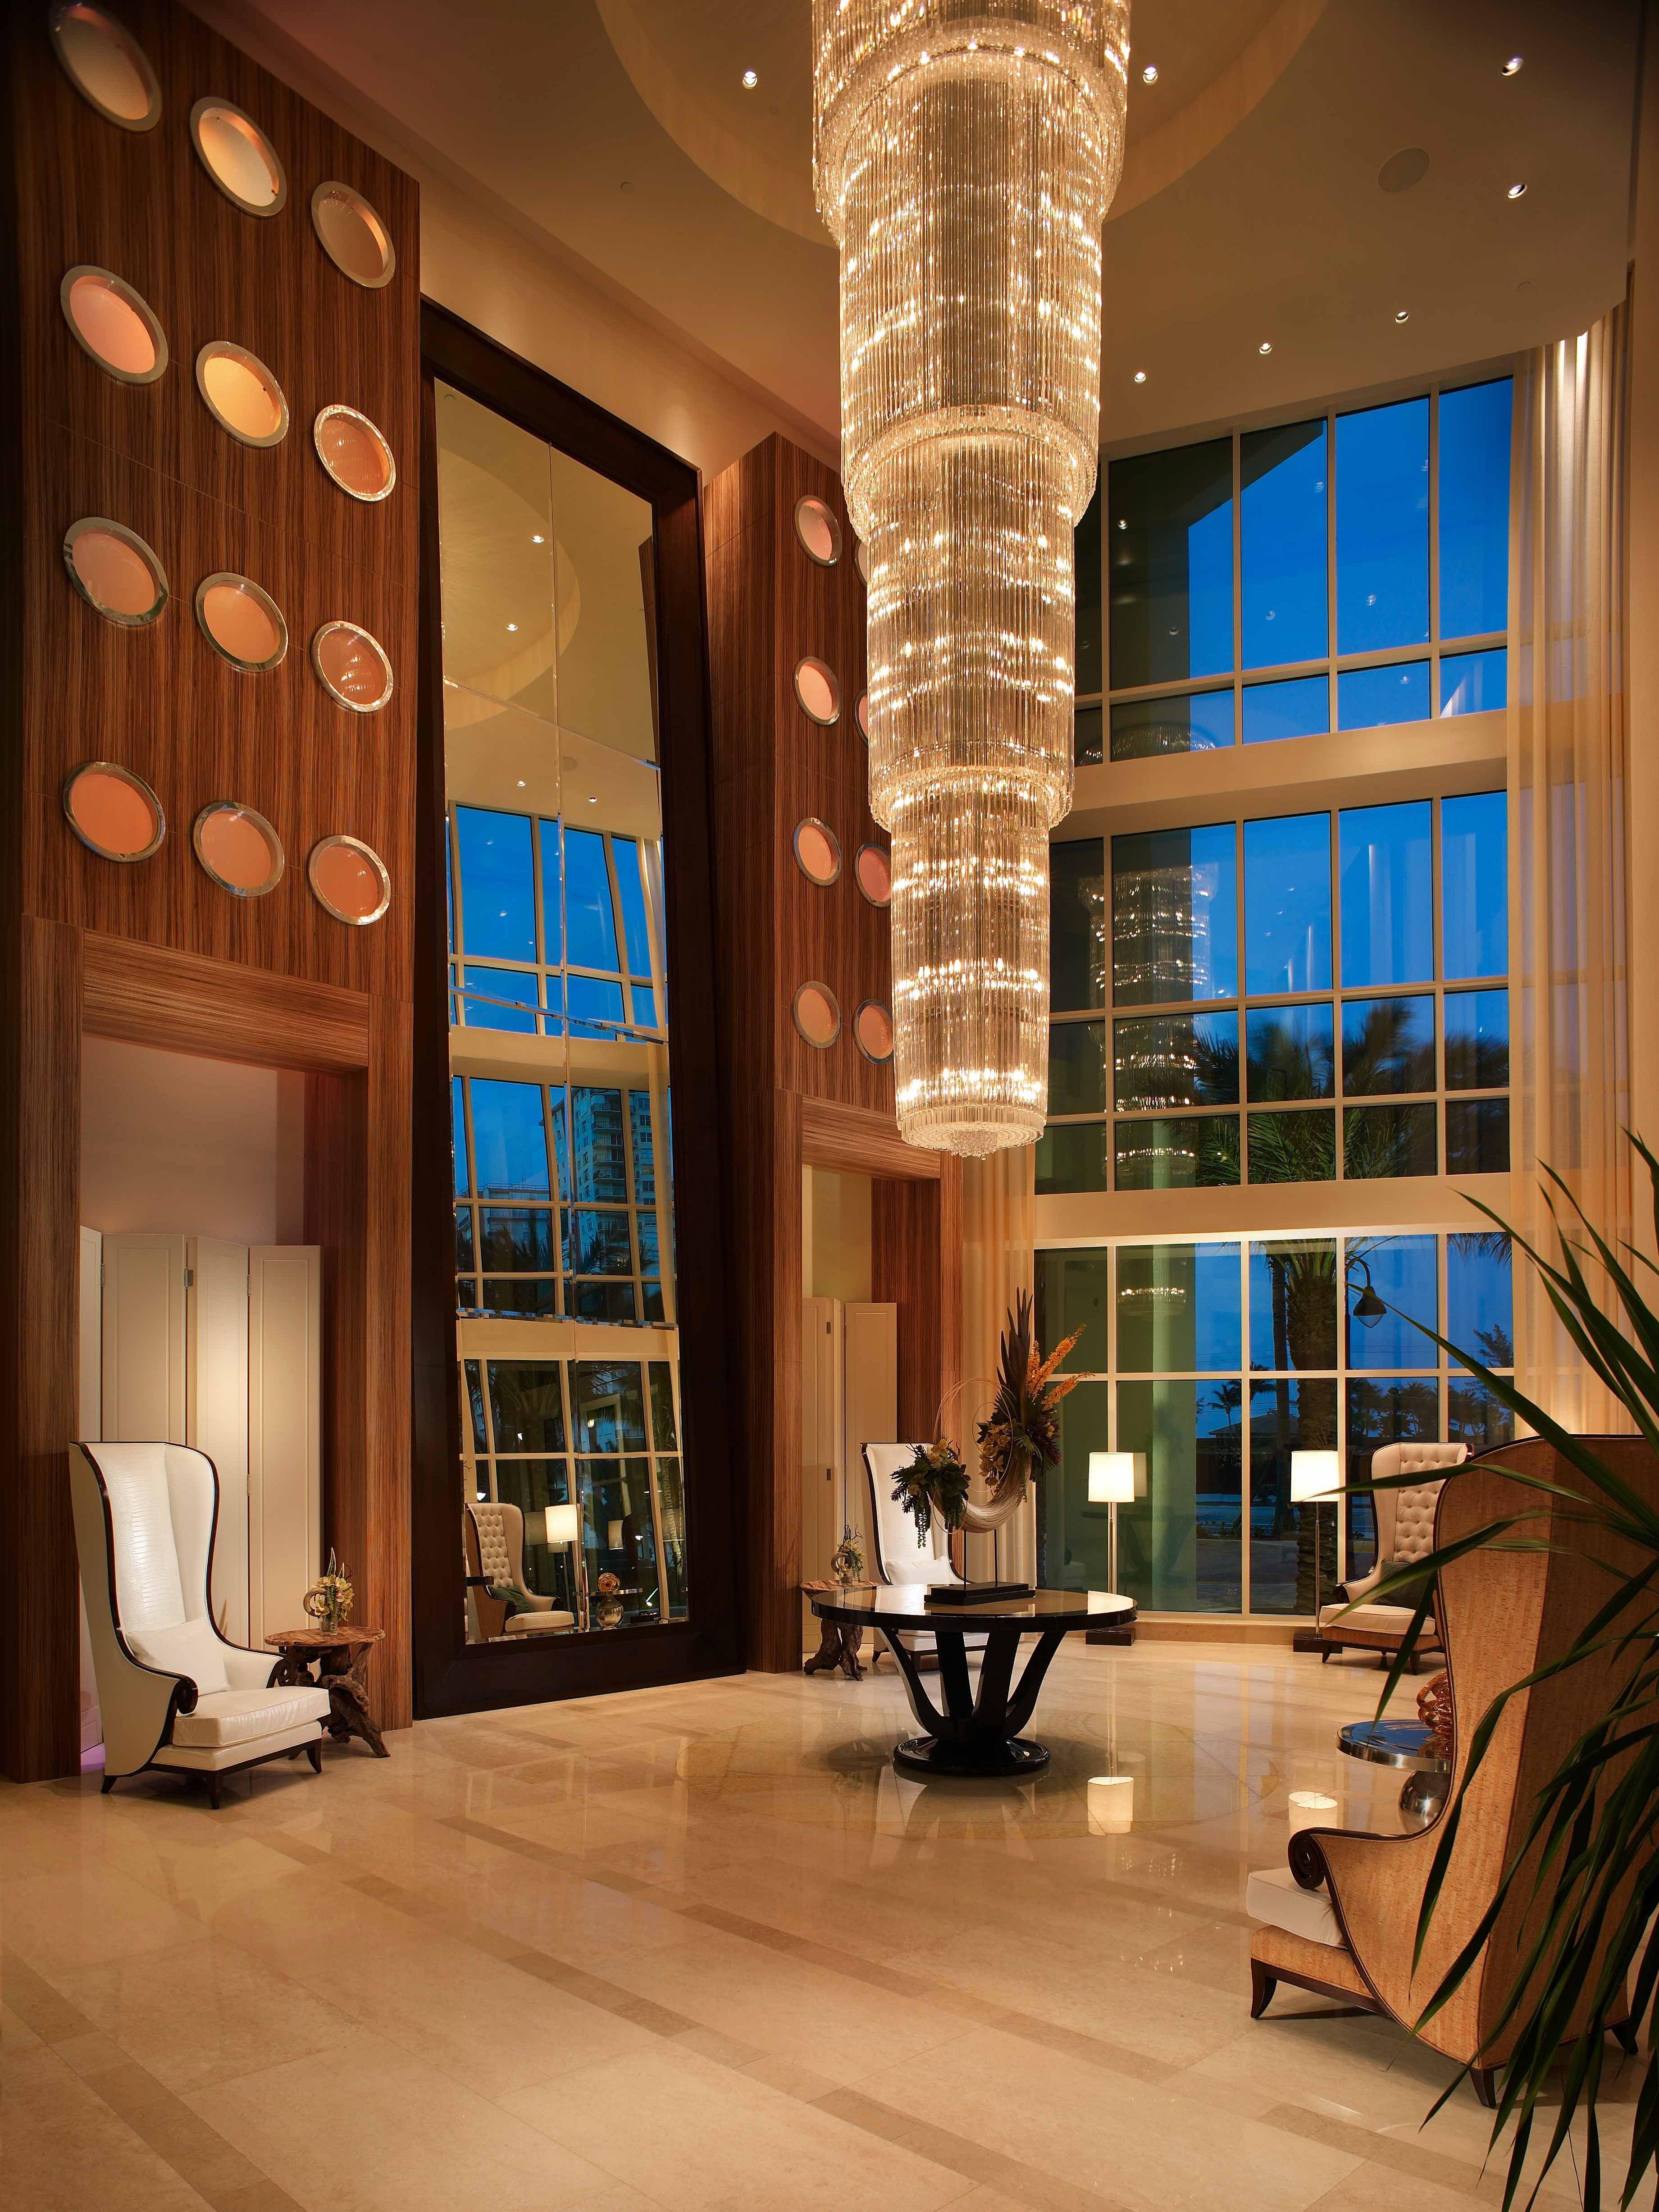 Exotic Hotel Rooms: Lobby Oceanside Pompano Beach, Florida